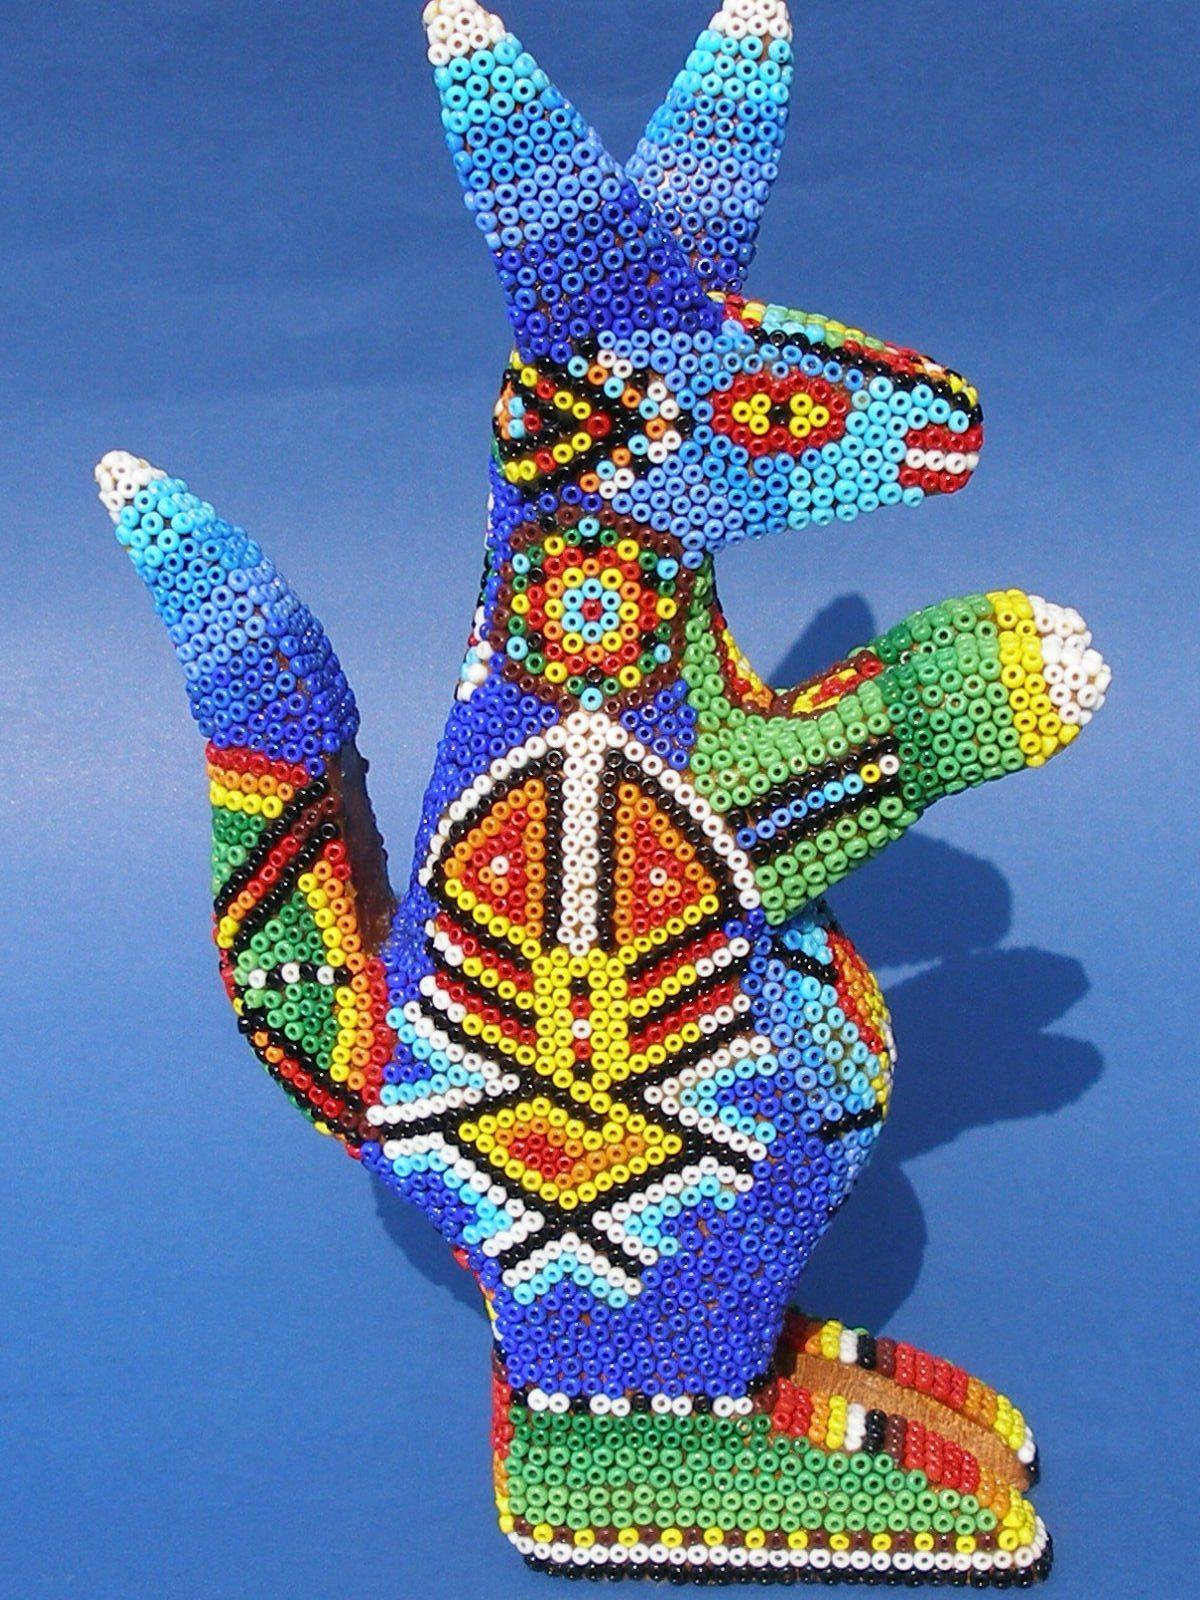 кенгуру из бисера народа уичоли